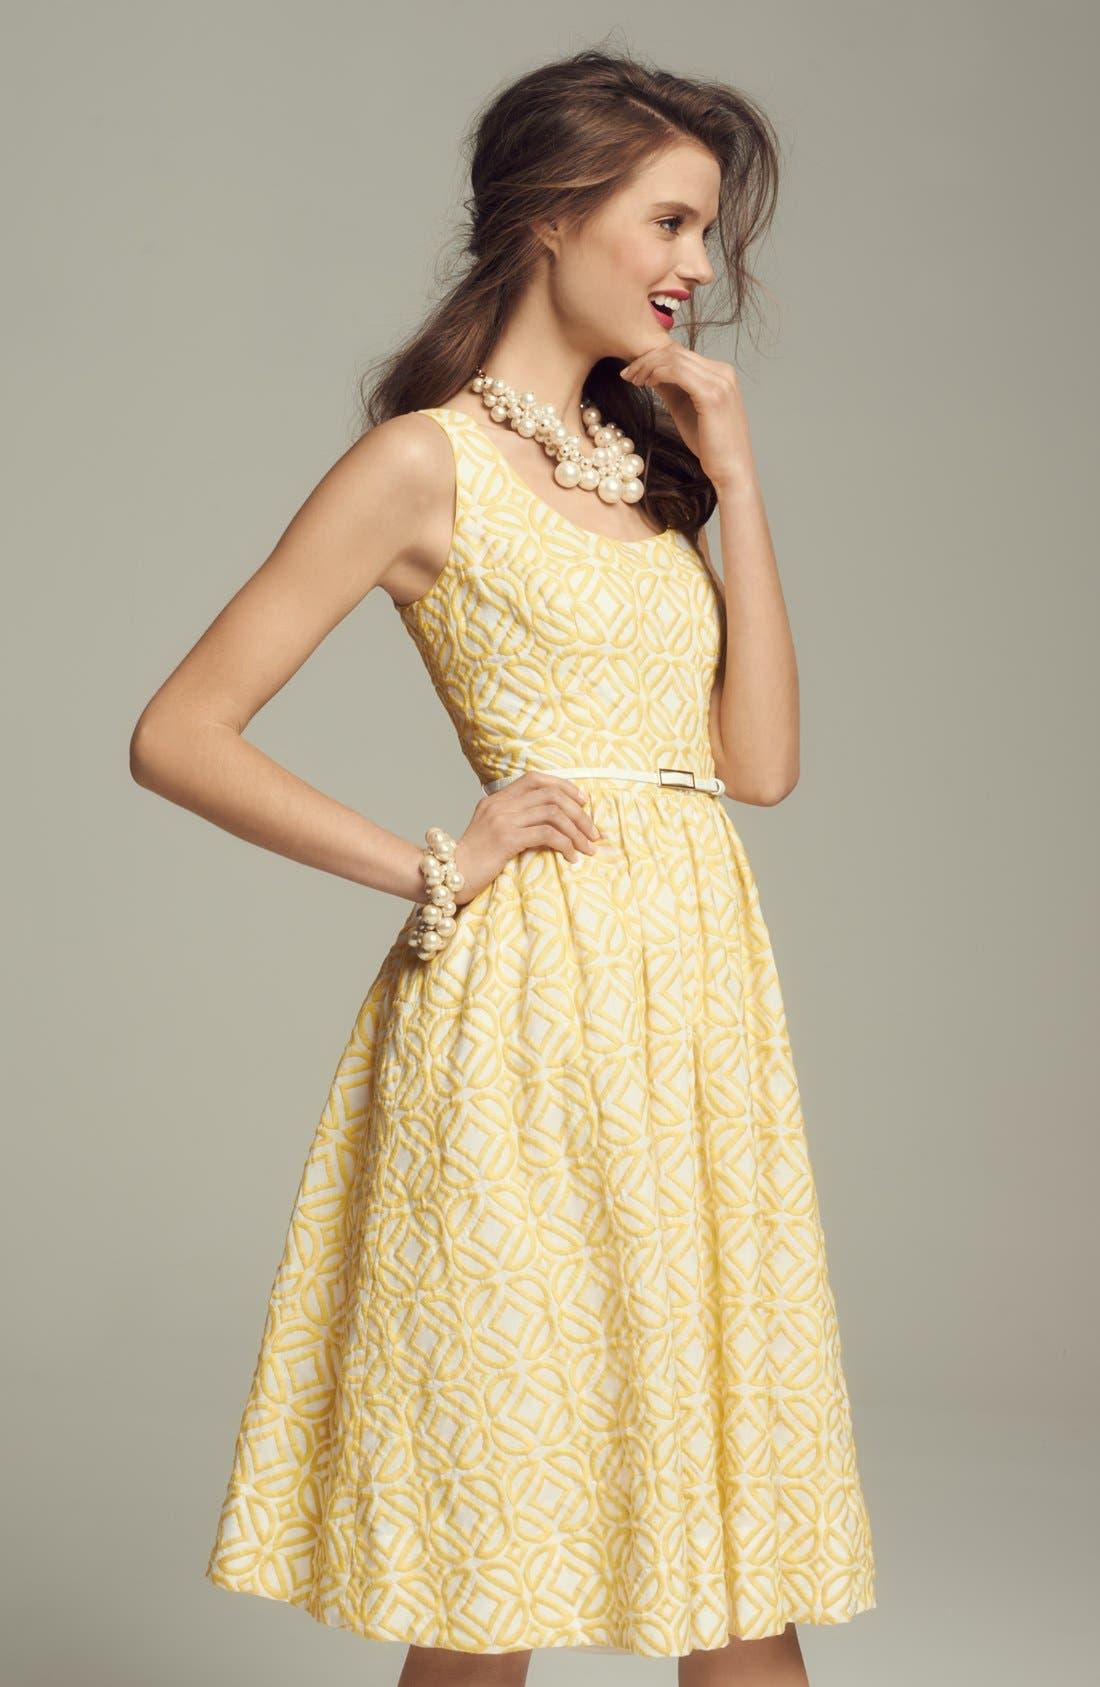 Alternate Image 1 Selected - Donna Morgan Jacquard Dress & Accessories